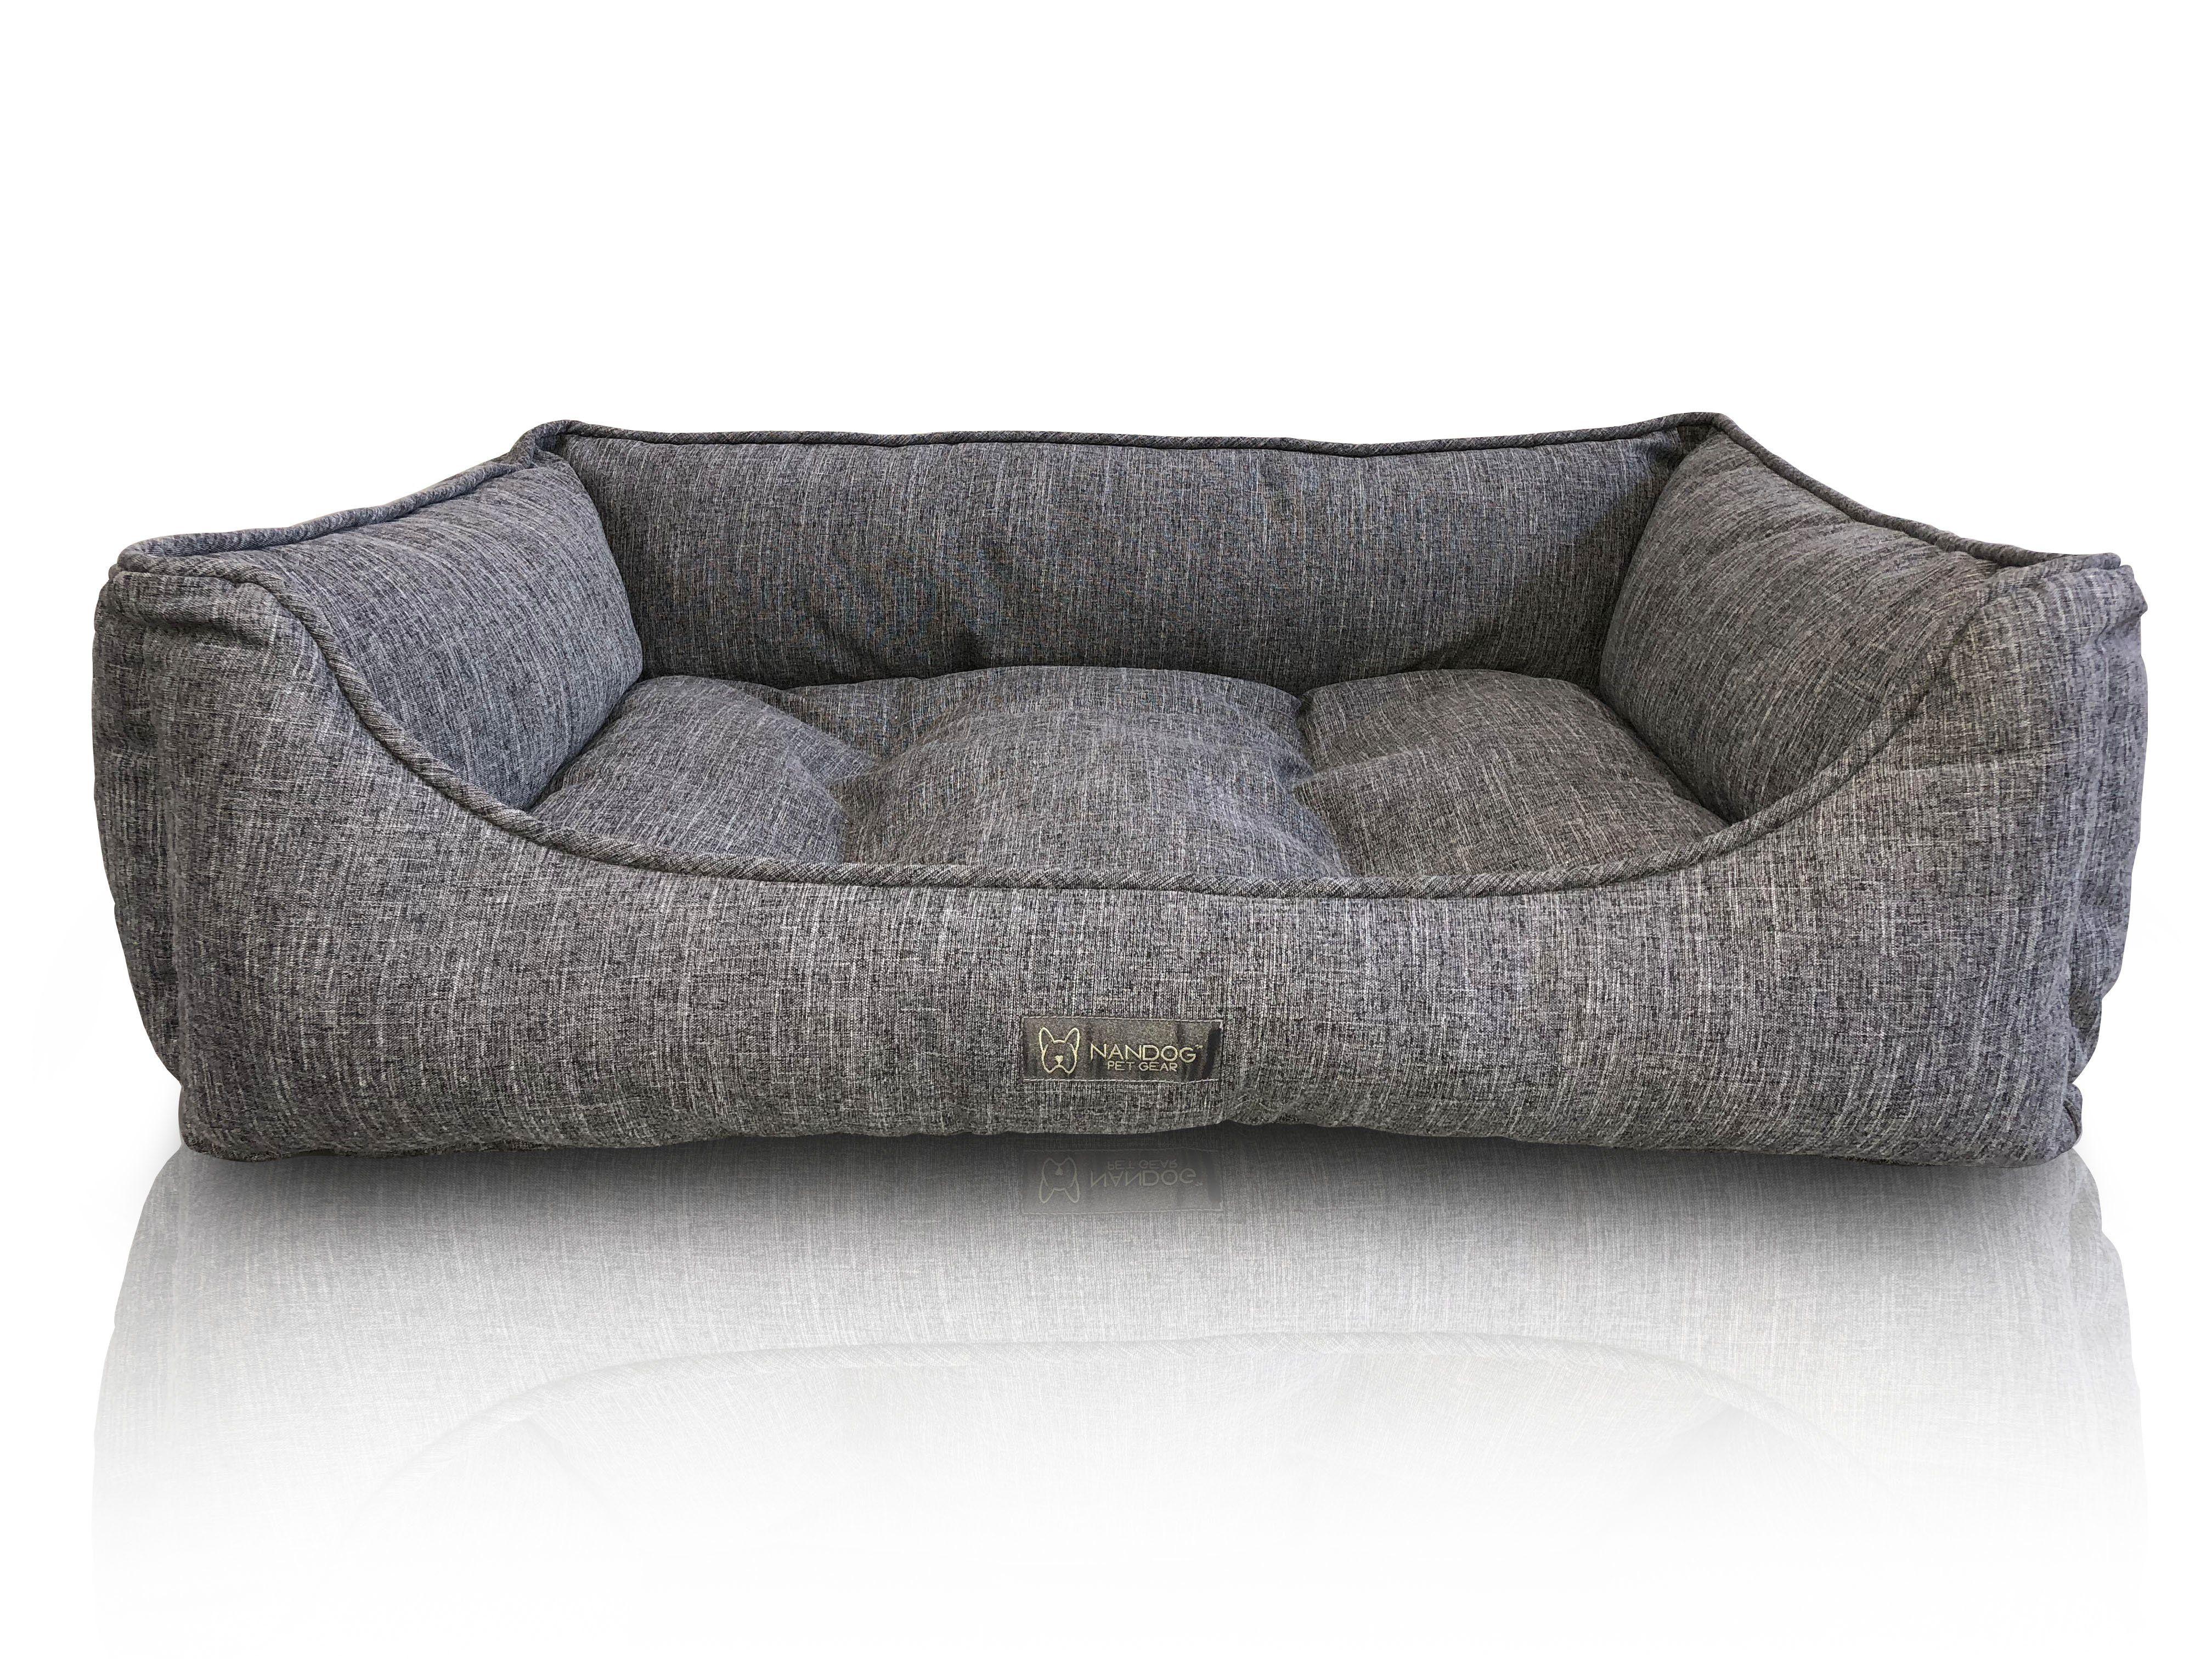 Poplin Large Reversible Dog Bed Gray I Nandog Dog Bed Stylish Dog Beds Dog Bed Modern